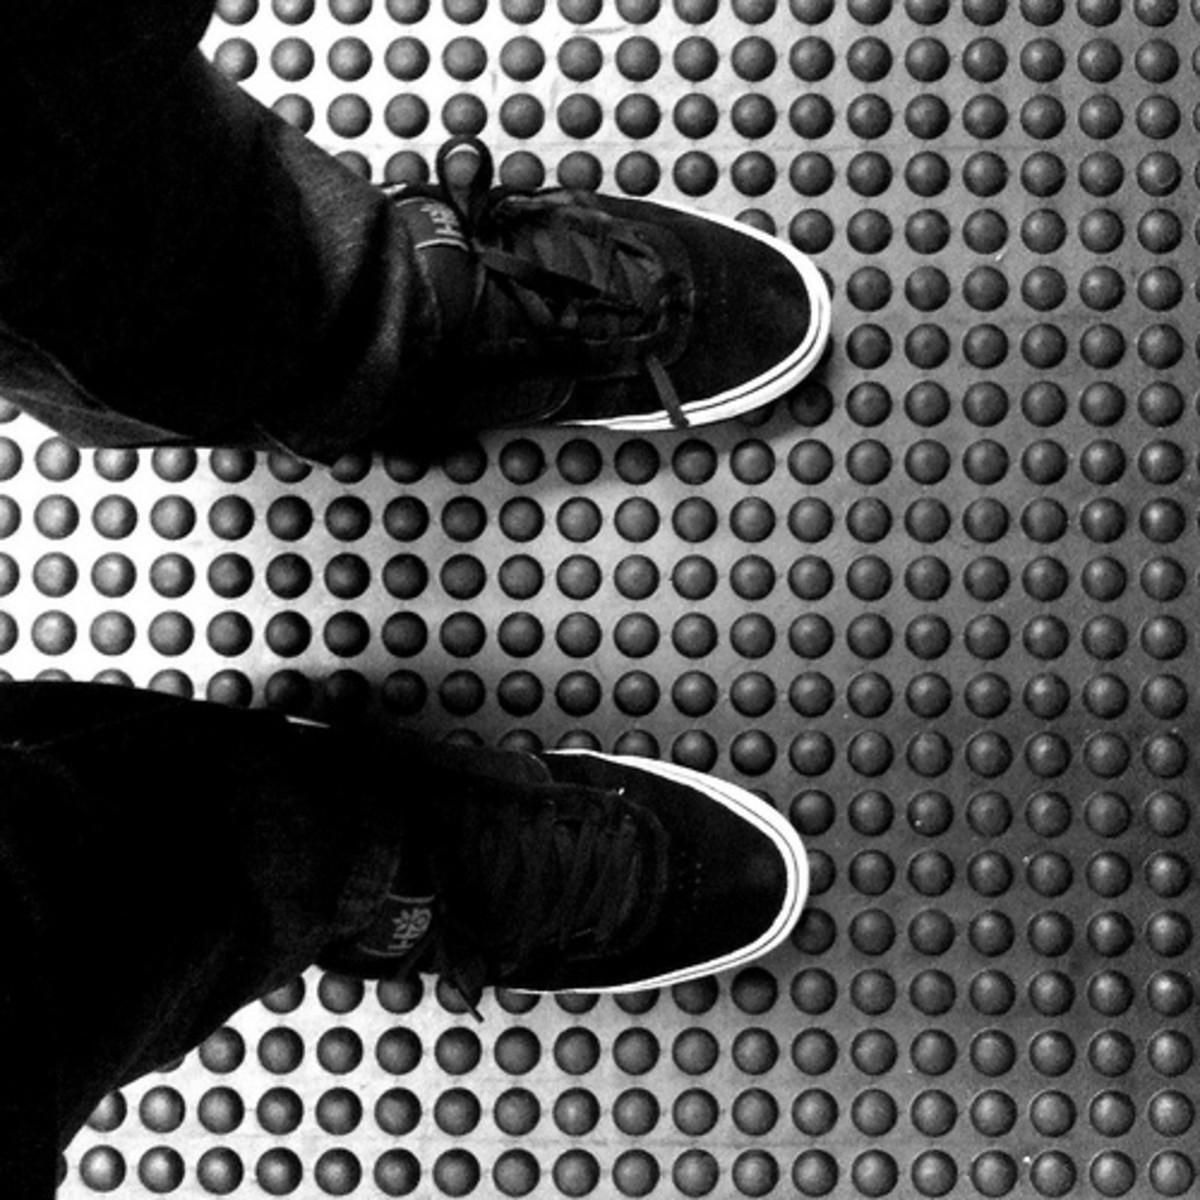 Anti-fatigue mats help reduce knee pain